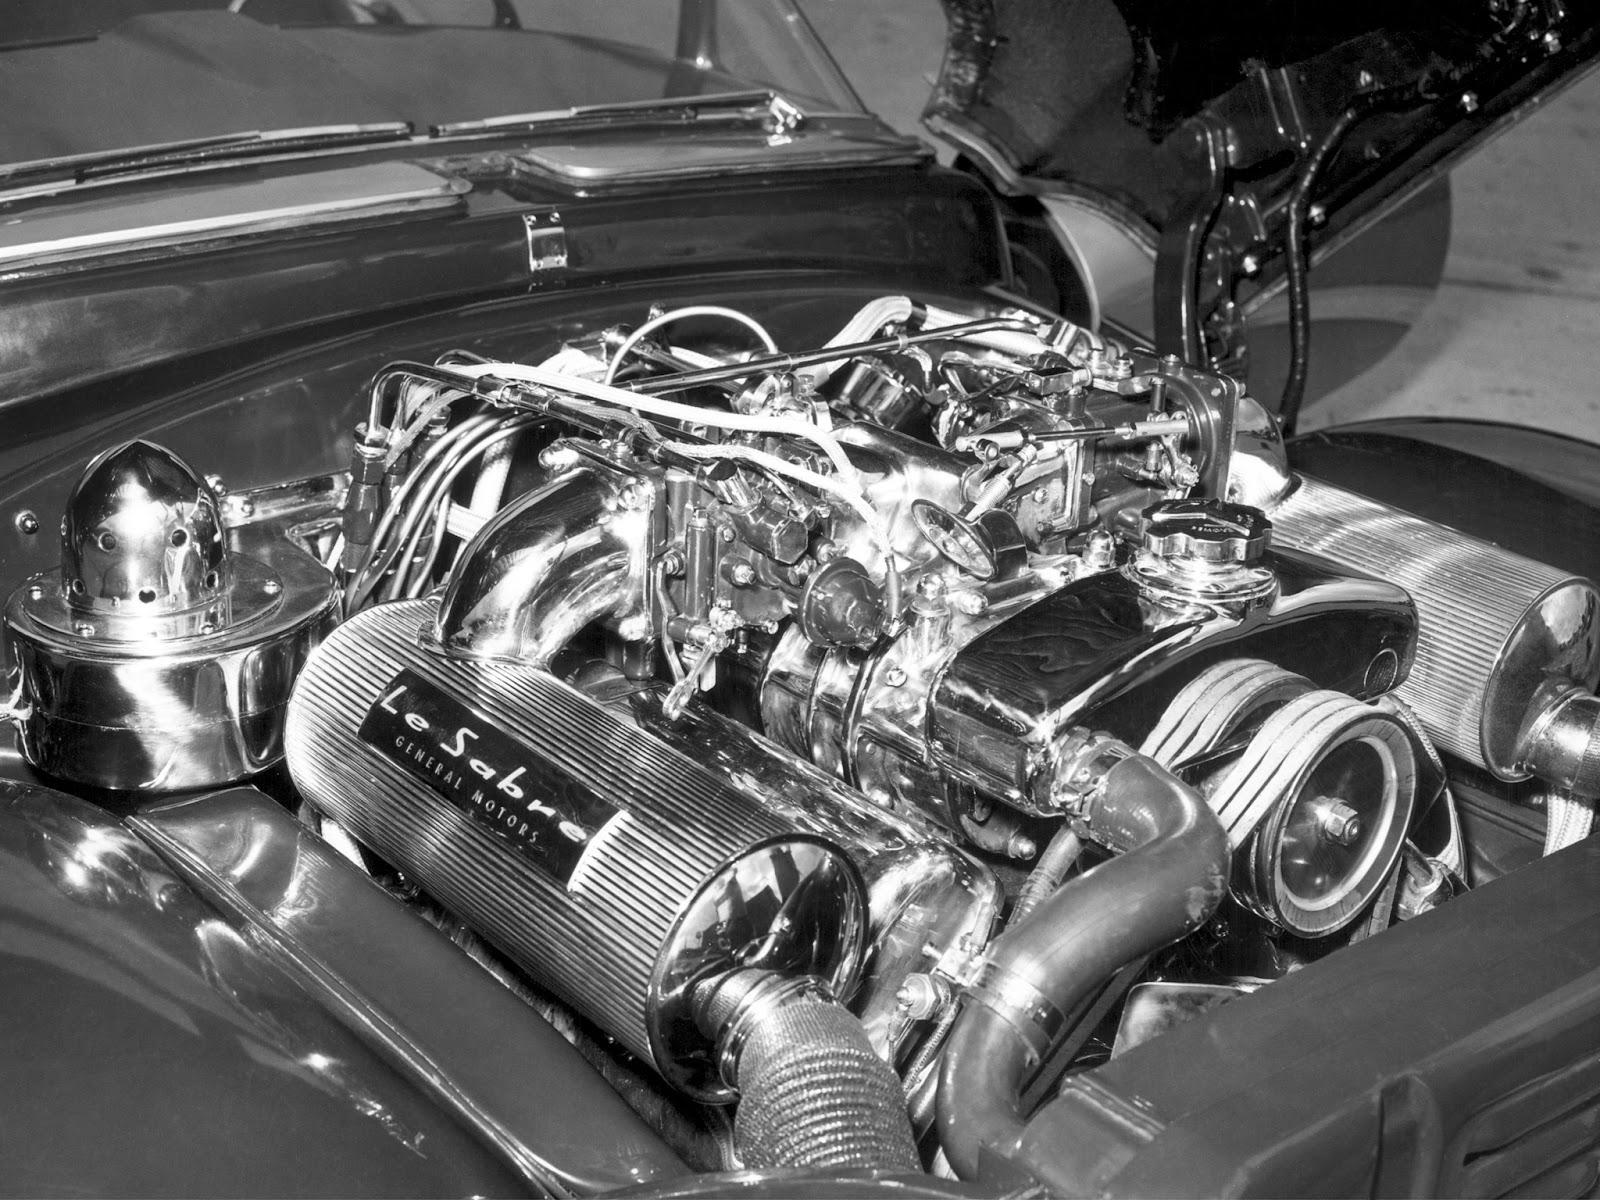 auto sport buick education motors gsx grand general center tour heritage history part